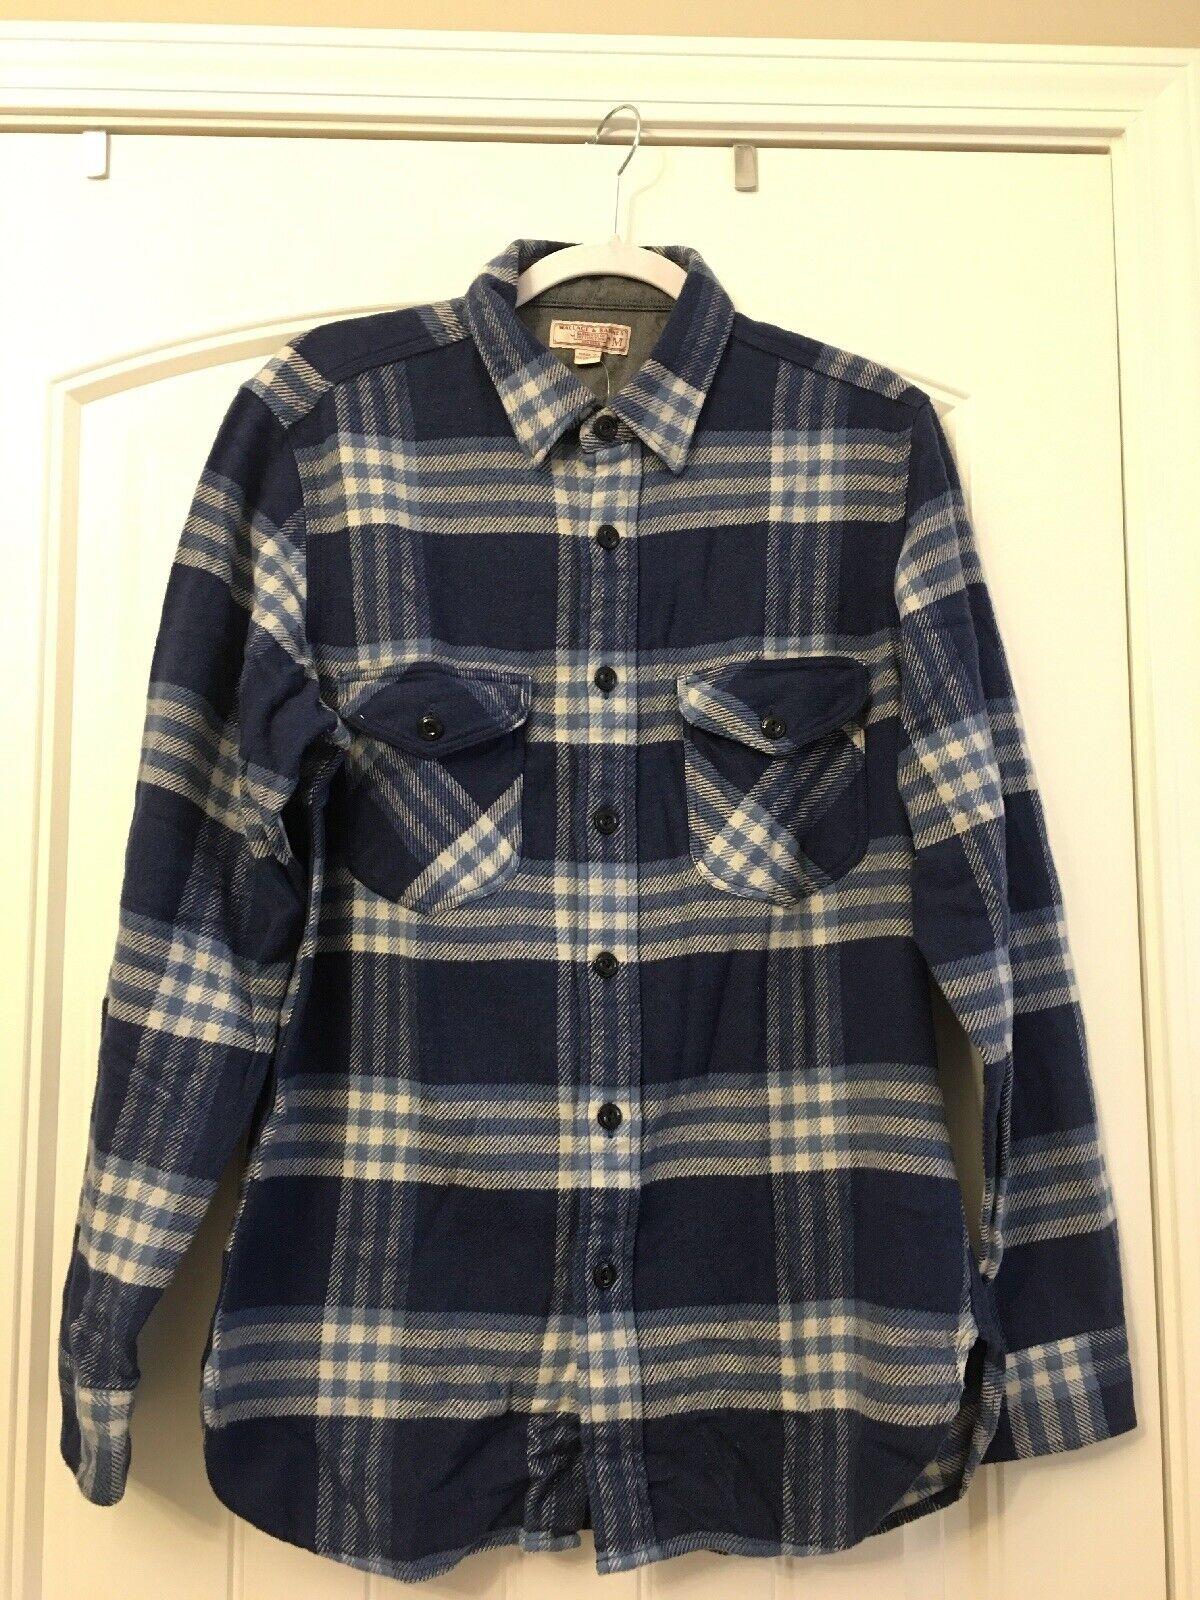 New JCrew Wallace & Barnes Heavyweight Flannel Shirt Vista Plaid bluee Sz M K2519